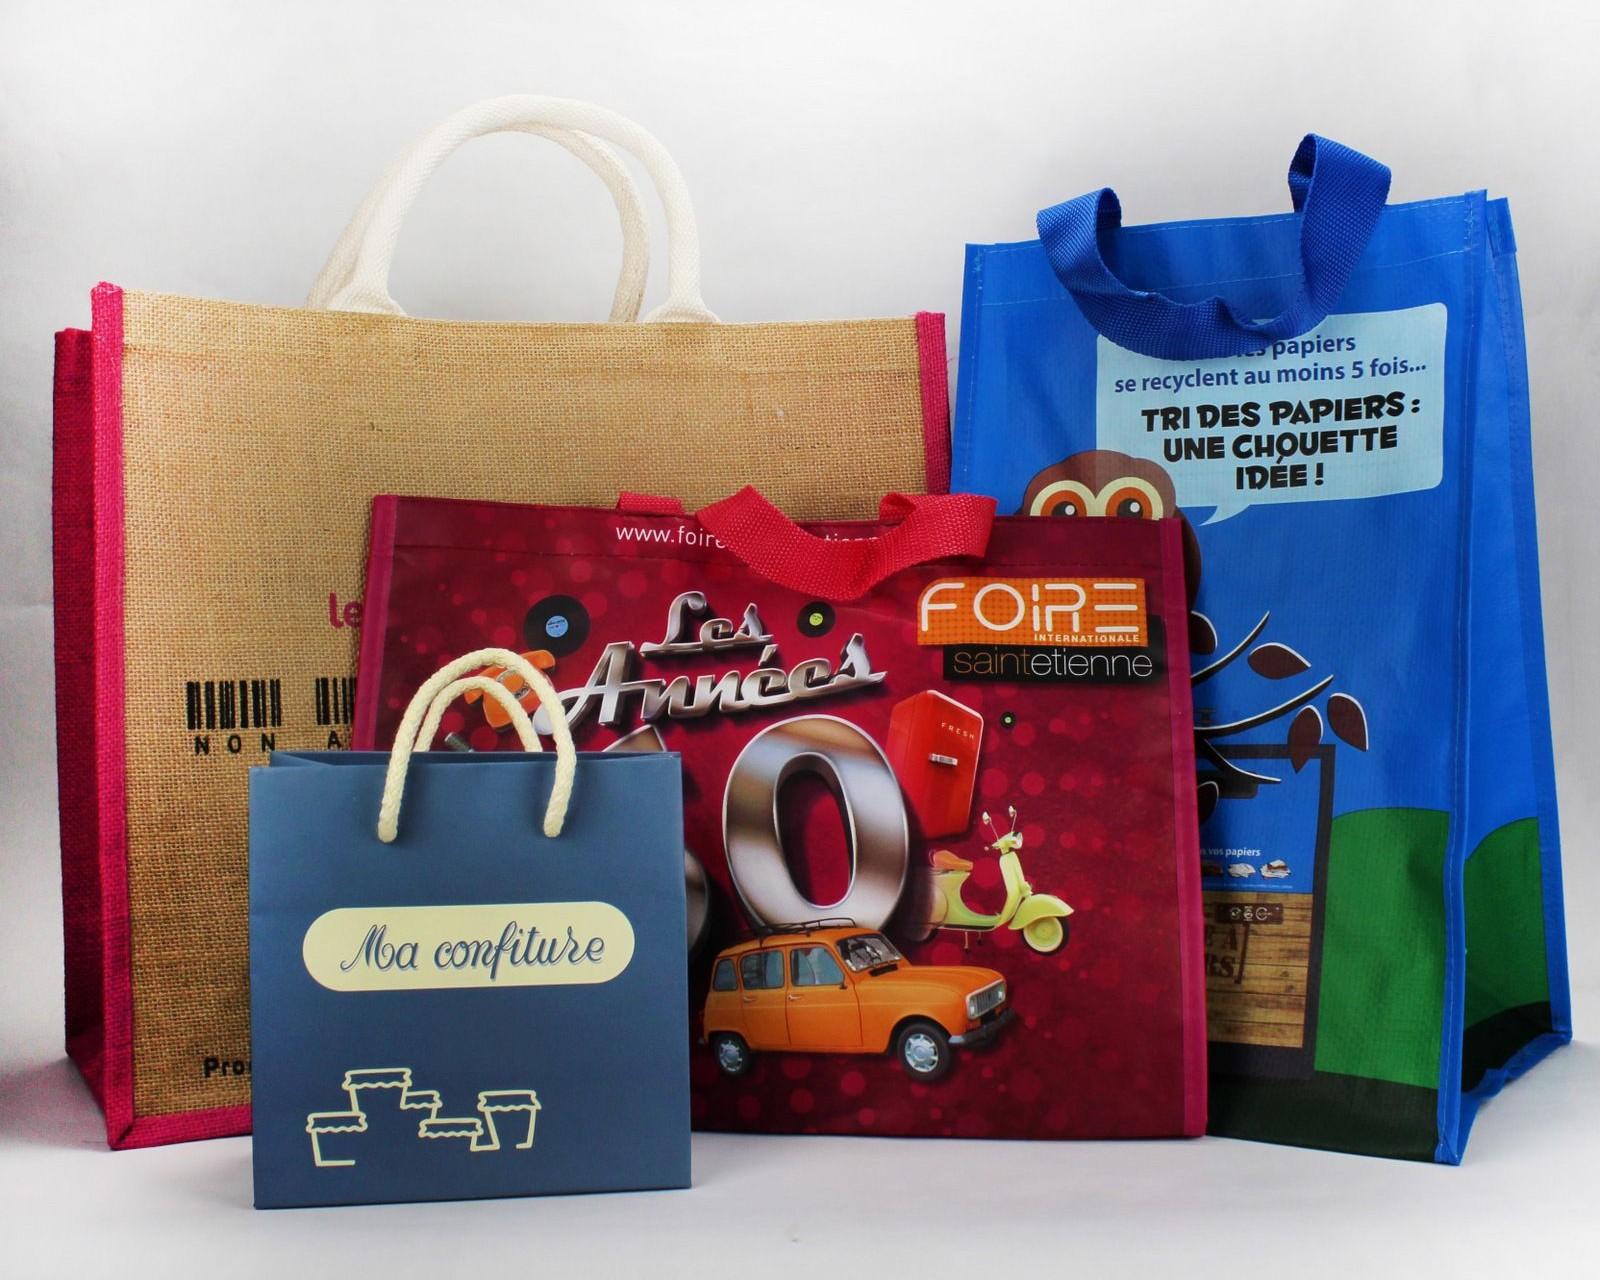 PLAST UP Fabricant cabas, sacs plastiques, emballages